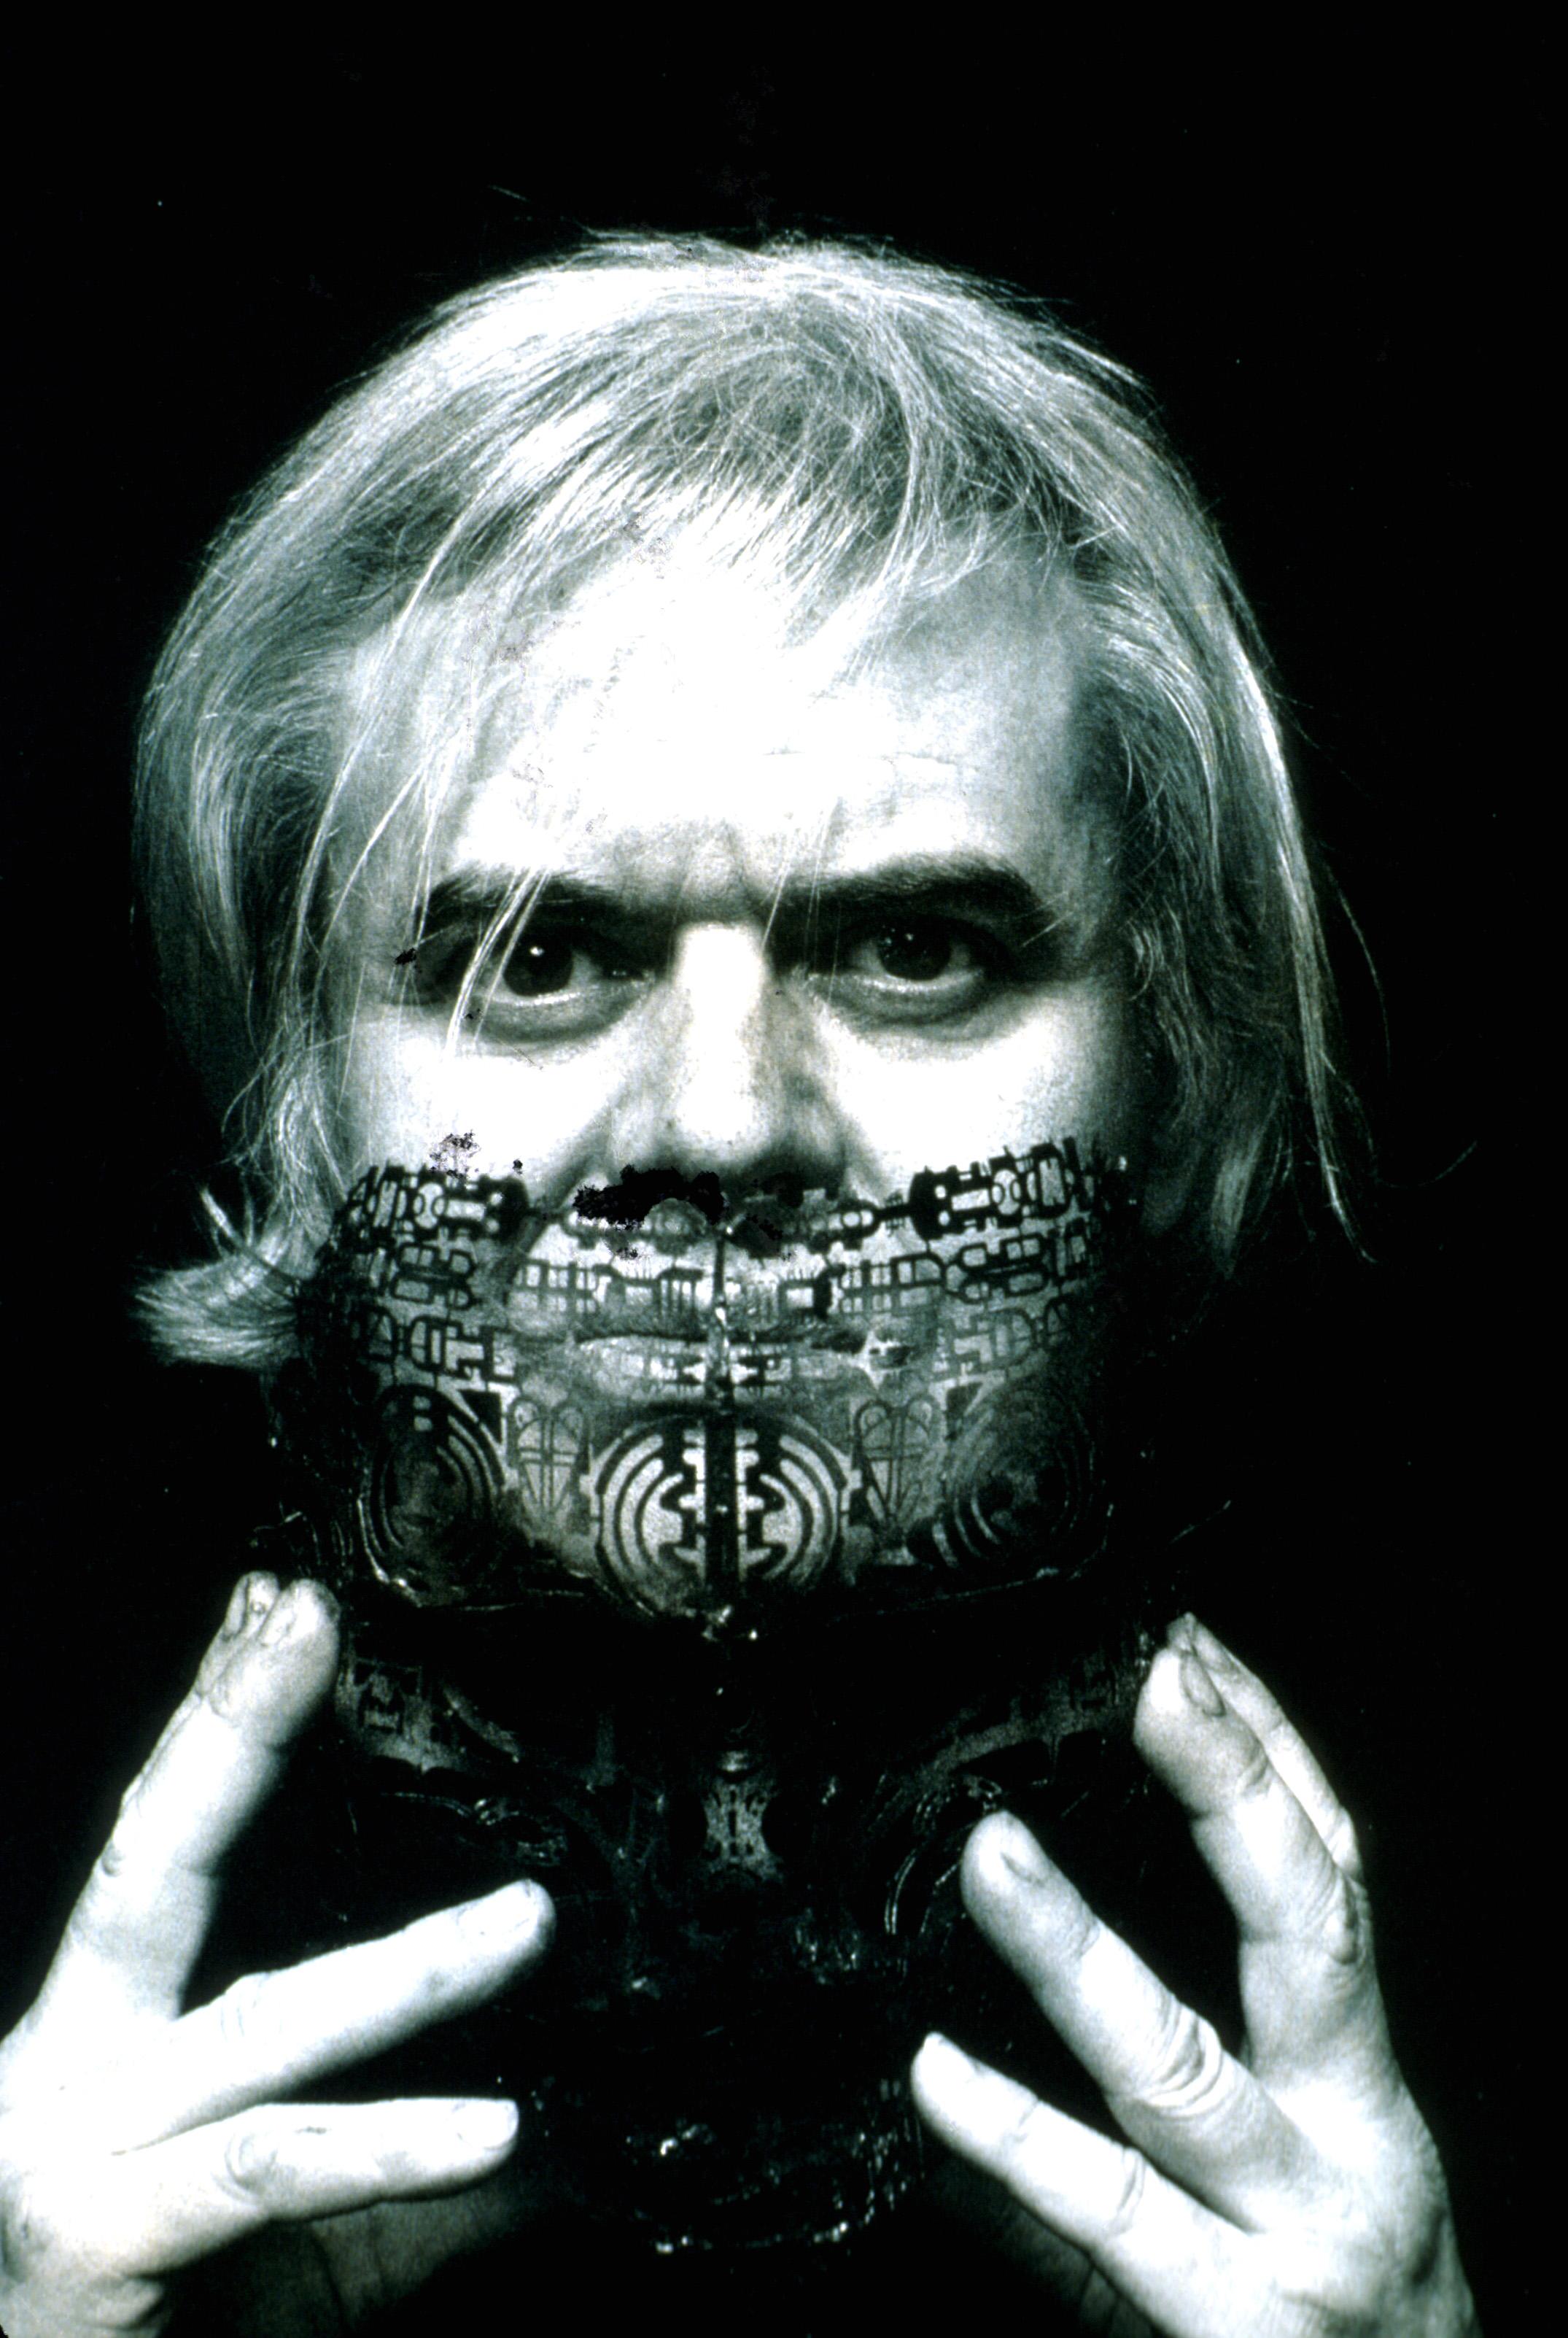 Visual artist H. R. Giger taking off face mask.